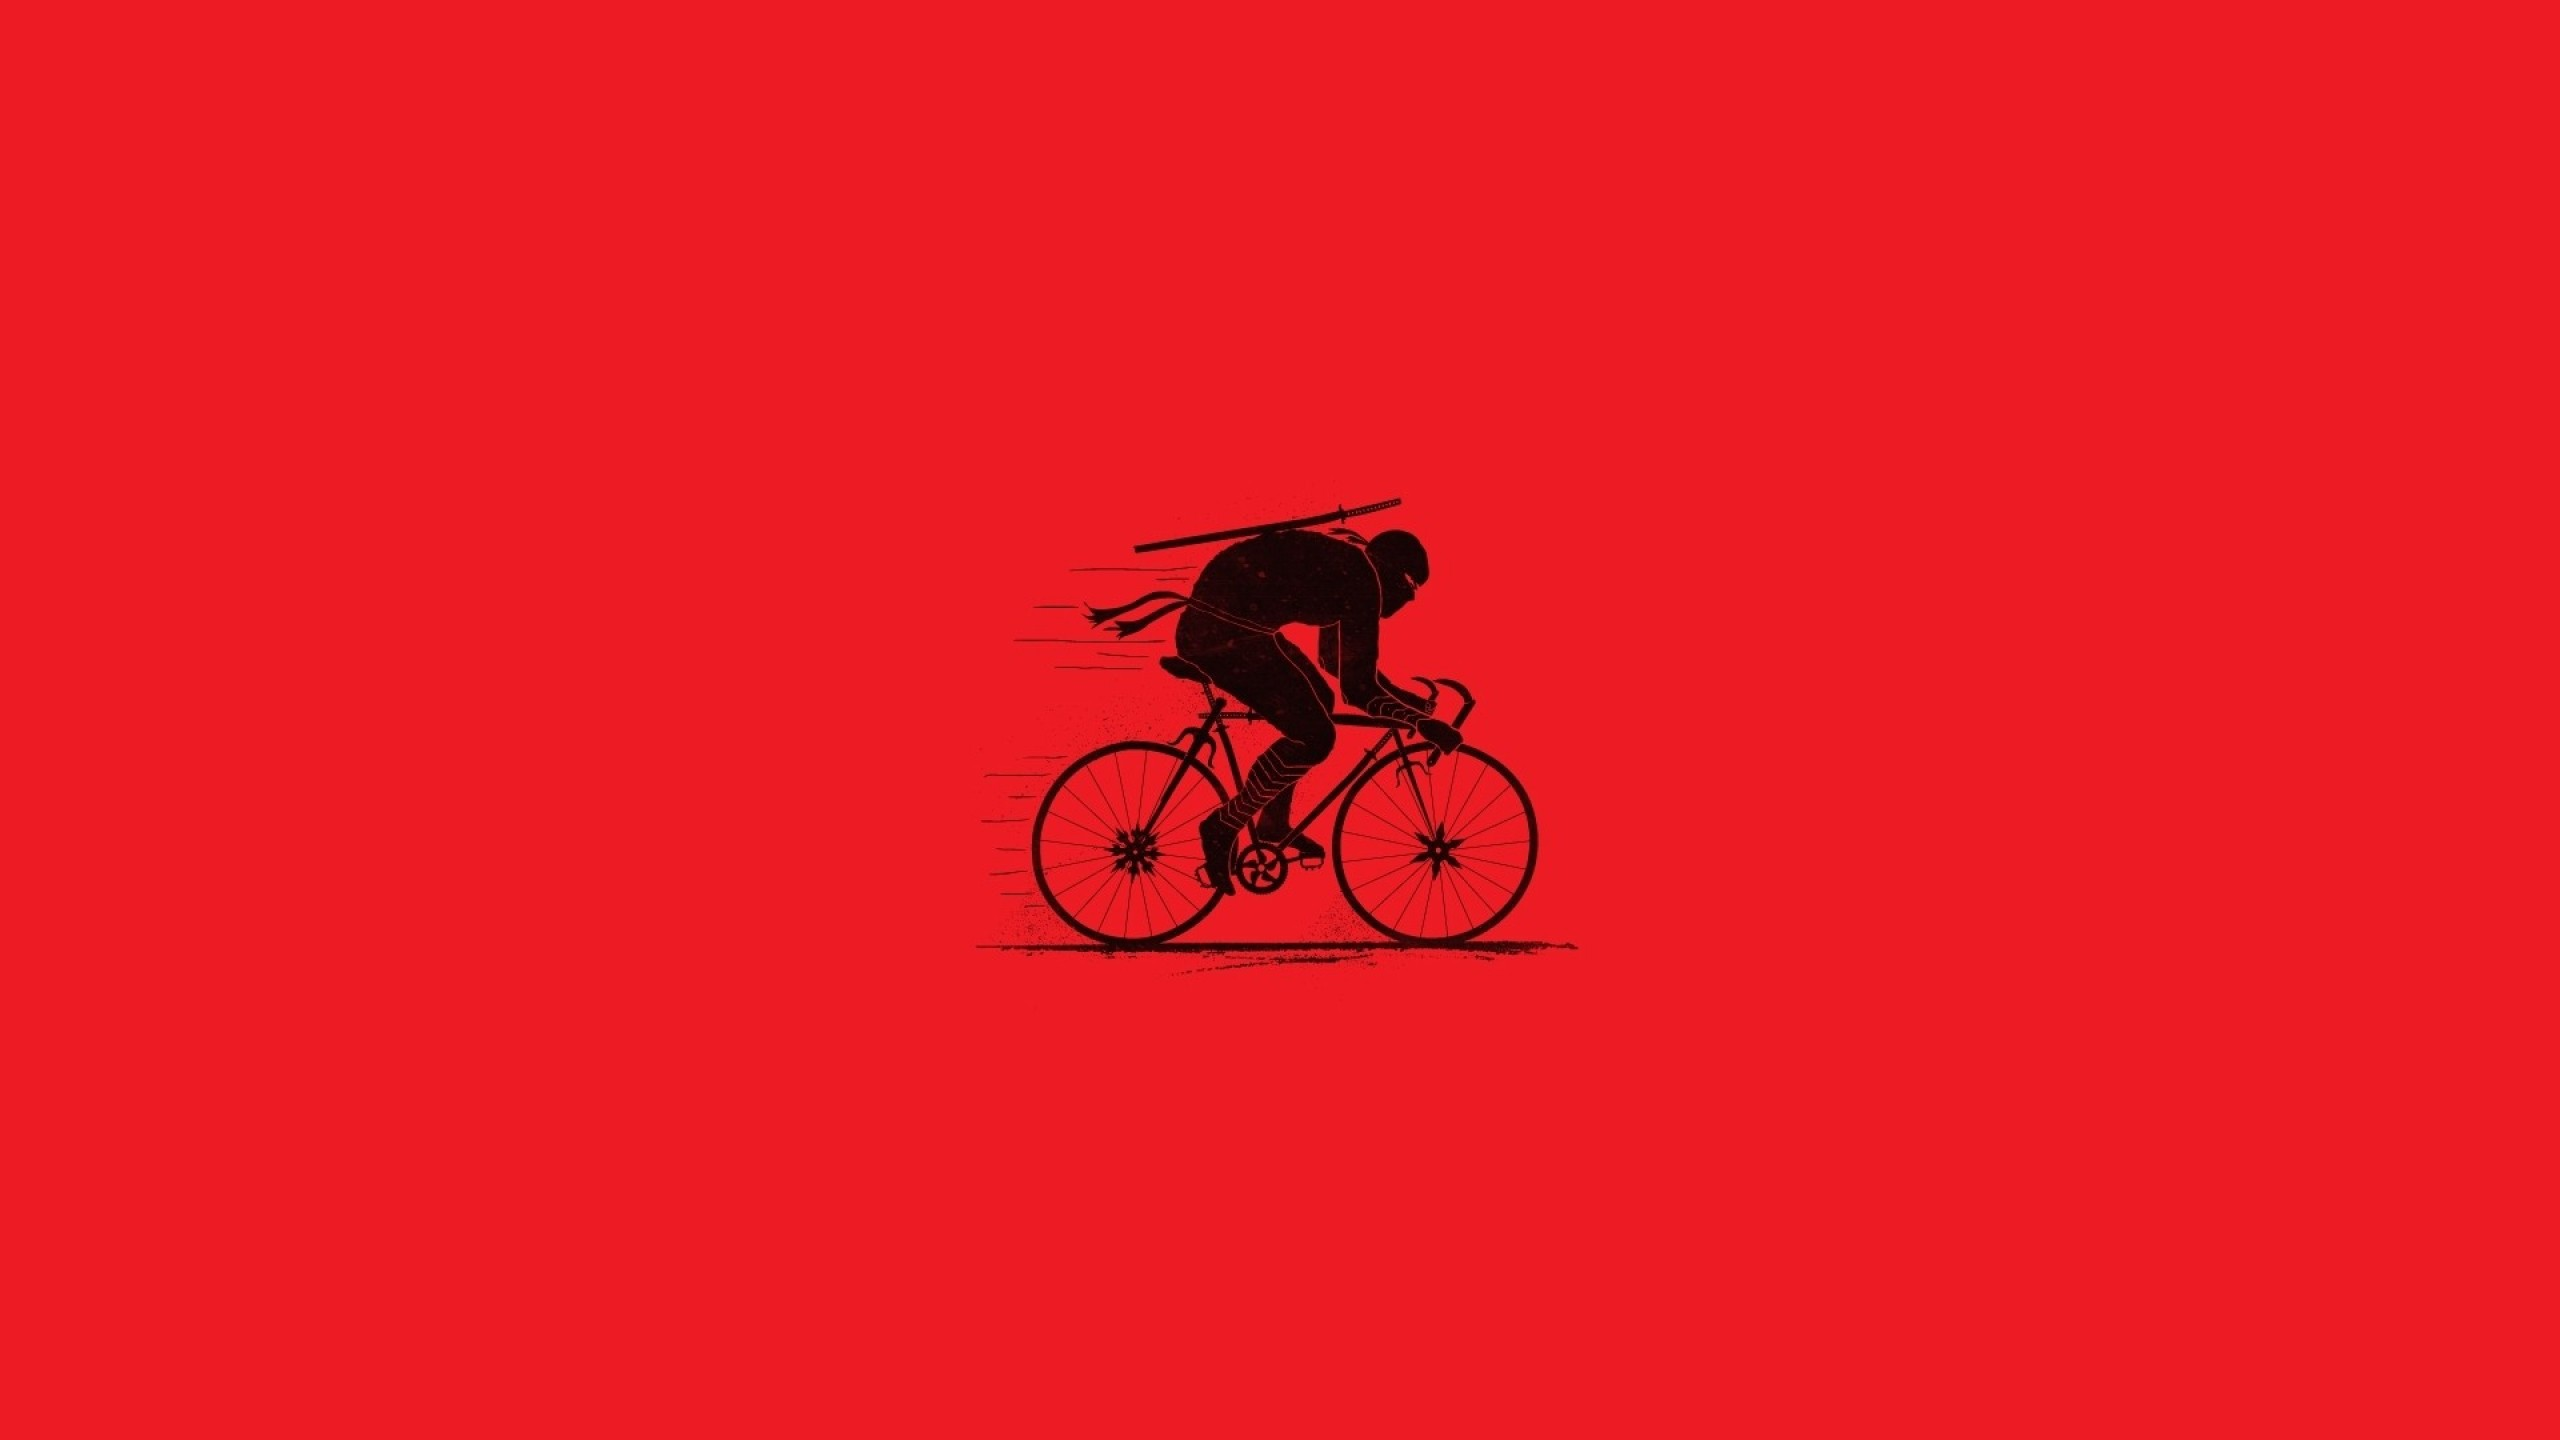 Mark Of The Ninja Wallpaper 2560x1440